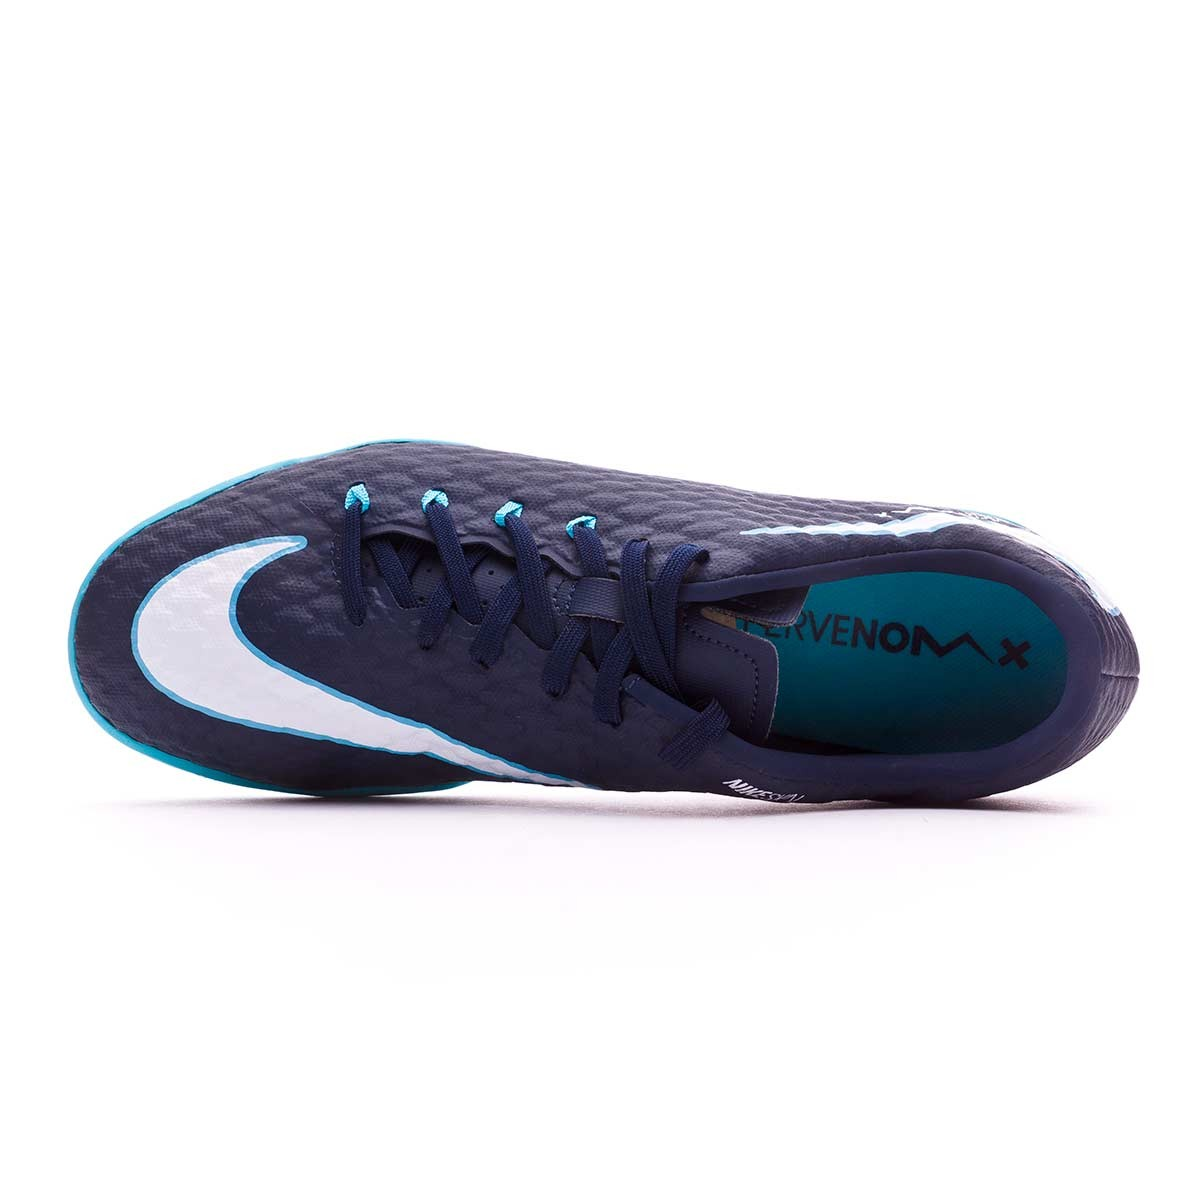 8b697fef2269 Futsal Boot Nike HypervenomX Phelon III IC Obsidian-White-Gamma blue-Glacier  blue - Tienda de fútbol Fútbol Emotion